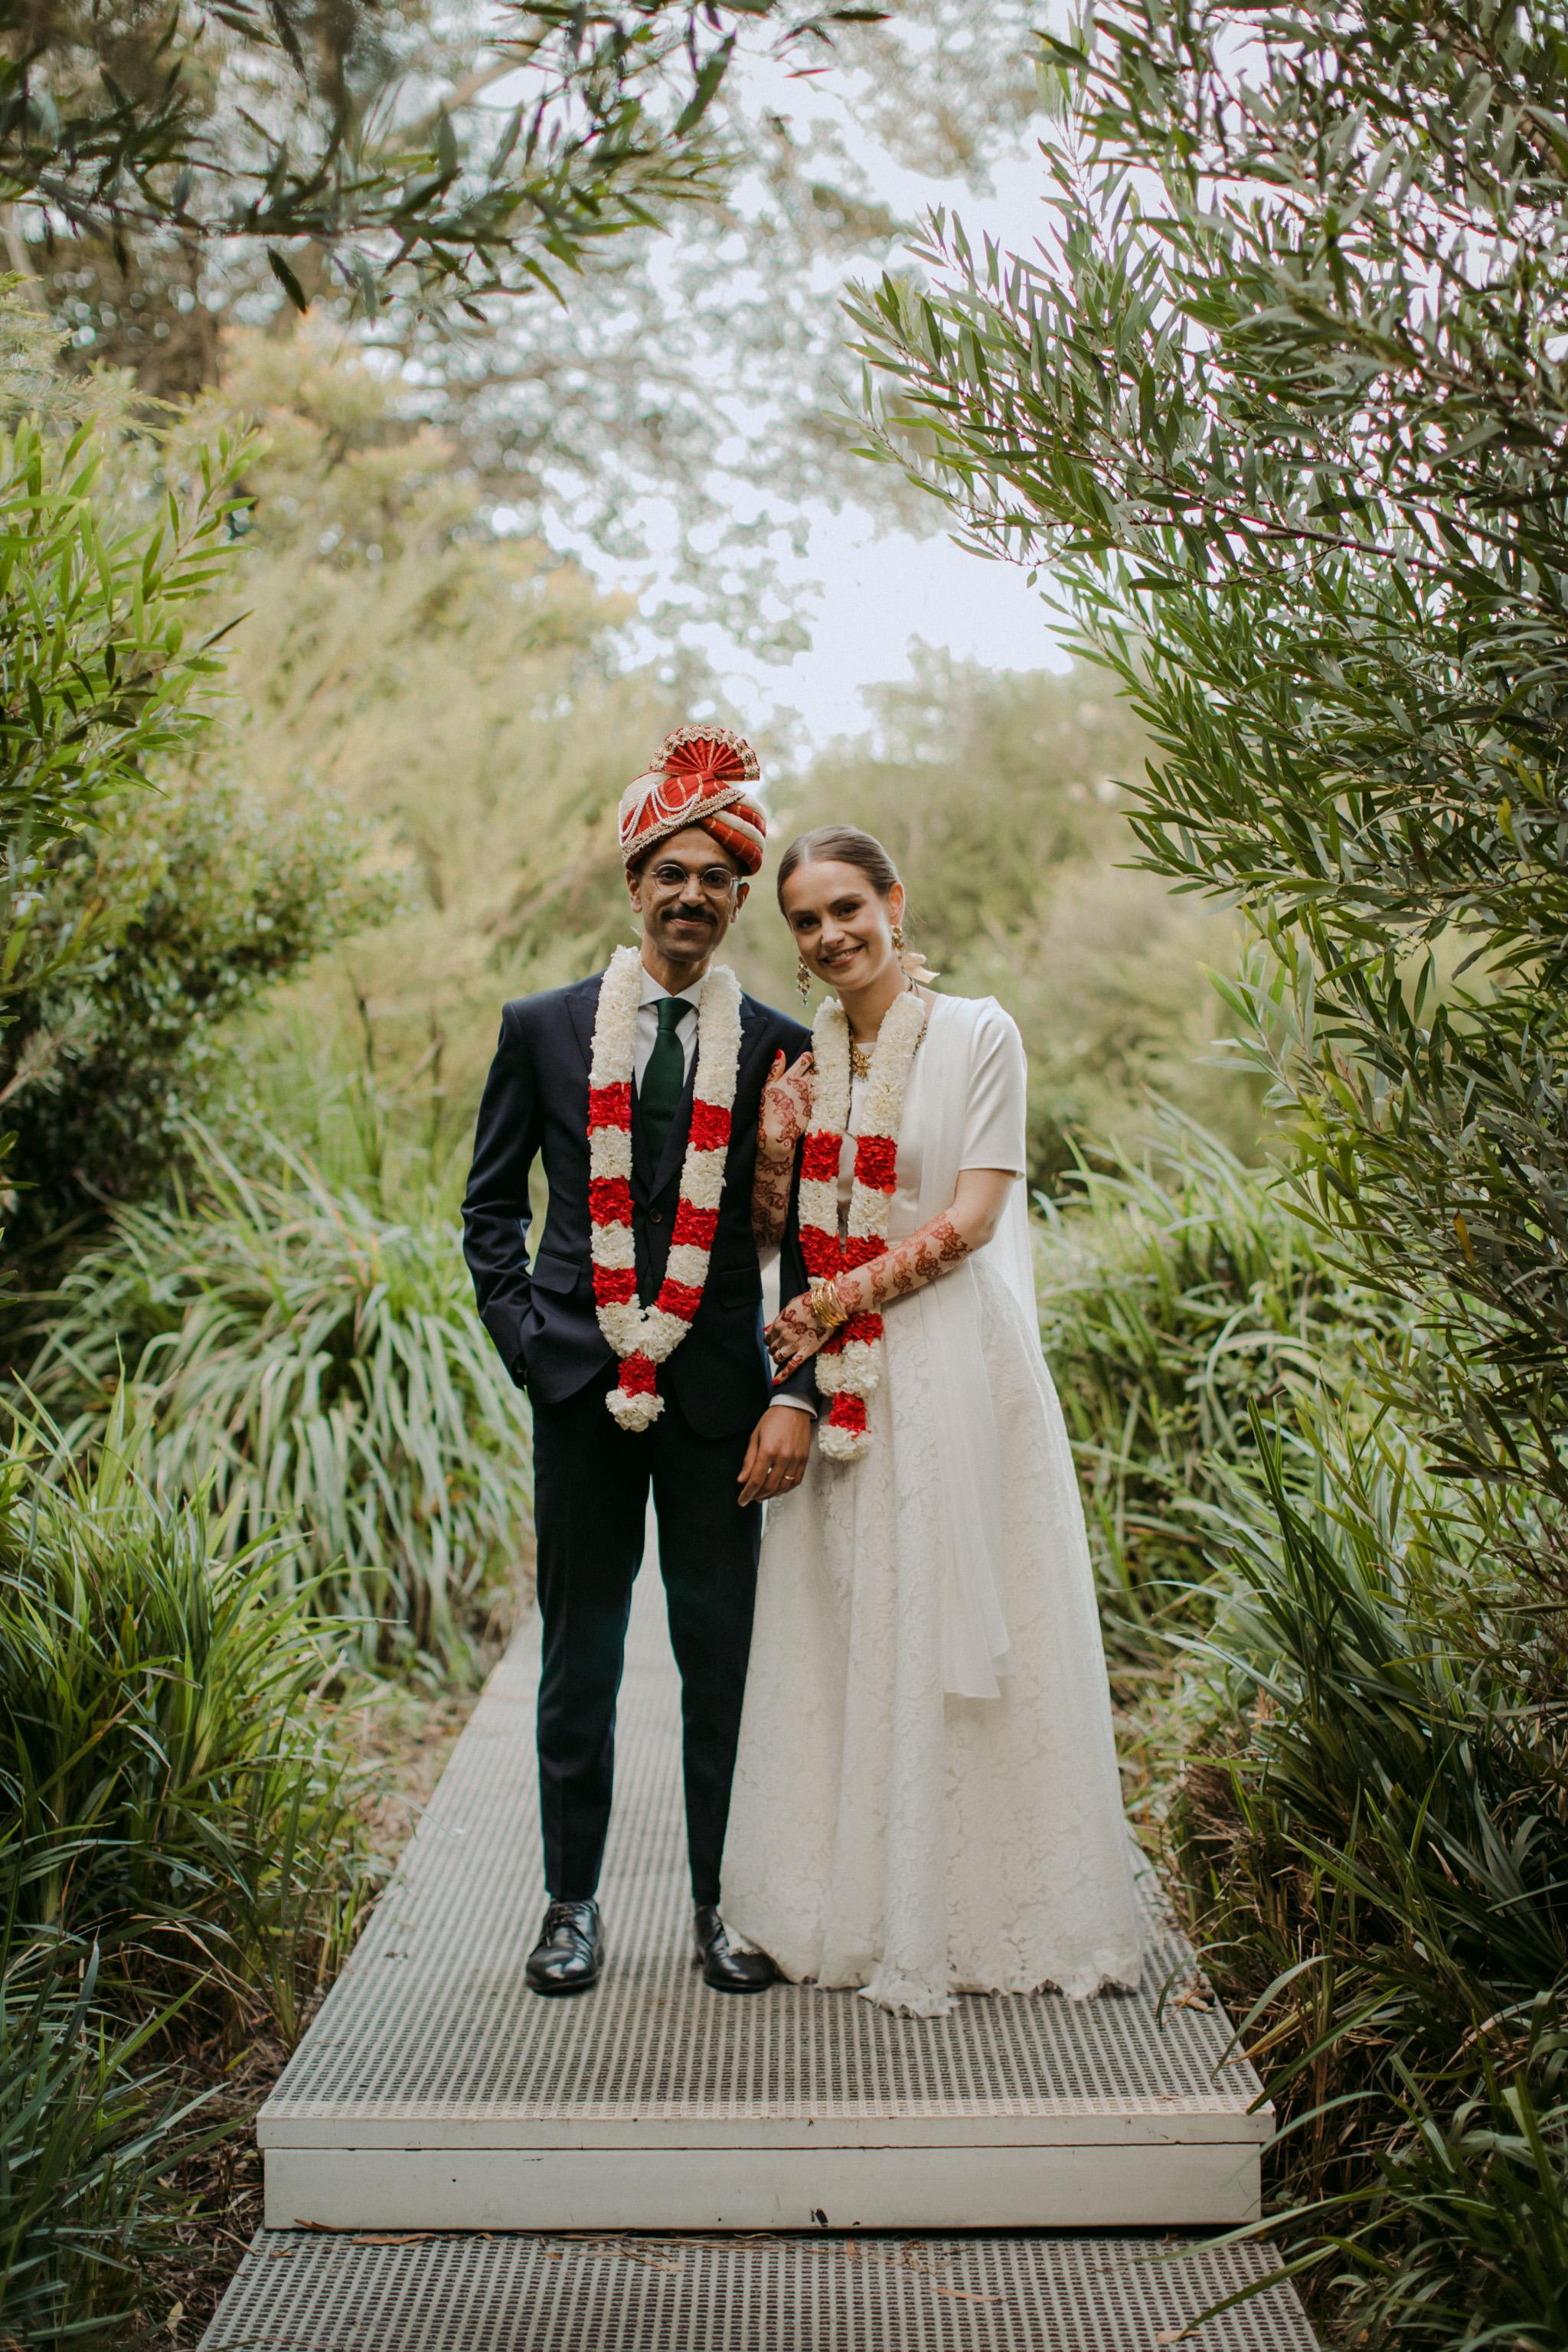 Amelia+Ani_Wedding_May2019_credit_OneDaySomewherePhotography-105.jpg